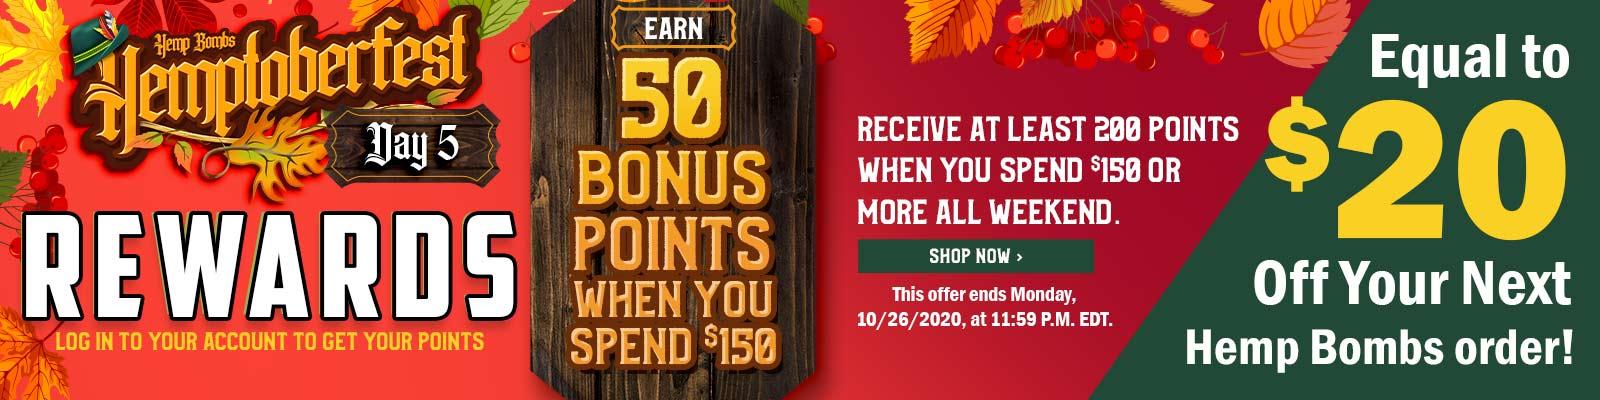 CBD Loyalty Program Point Bonus